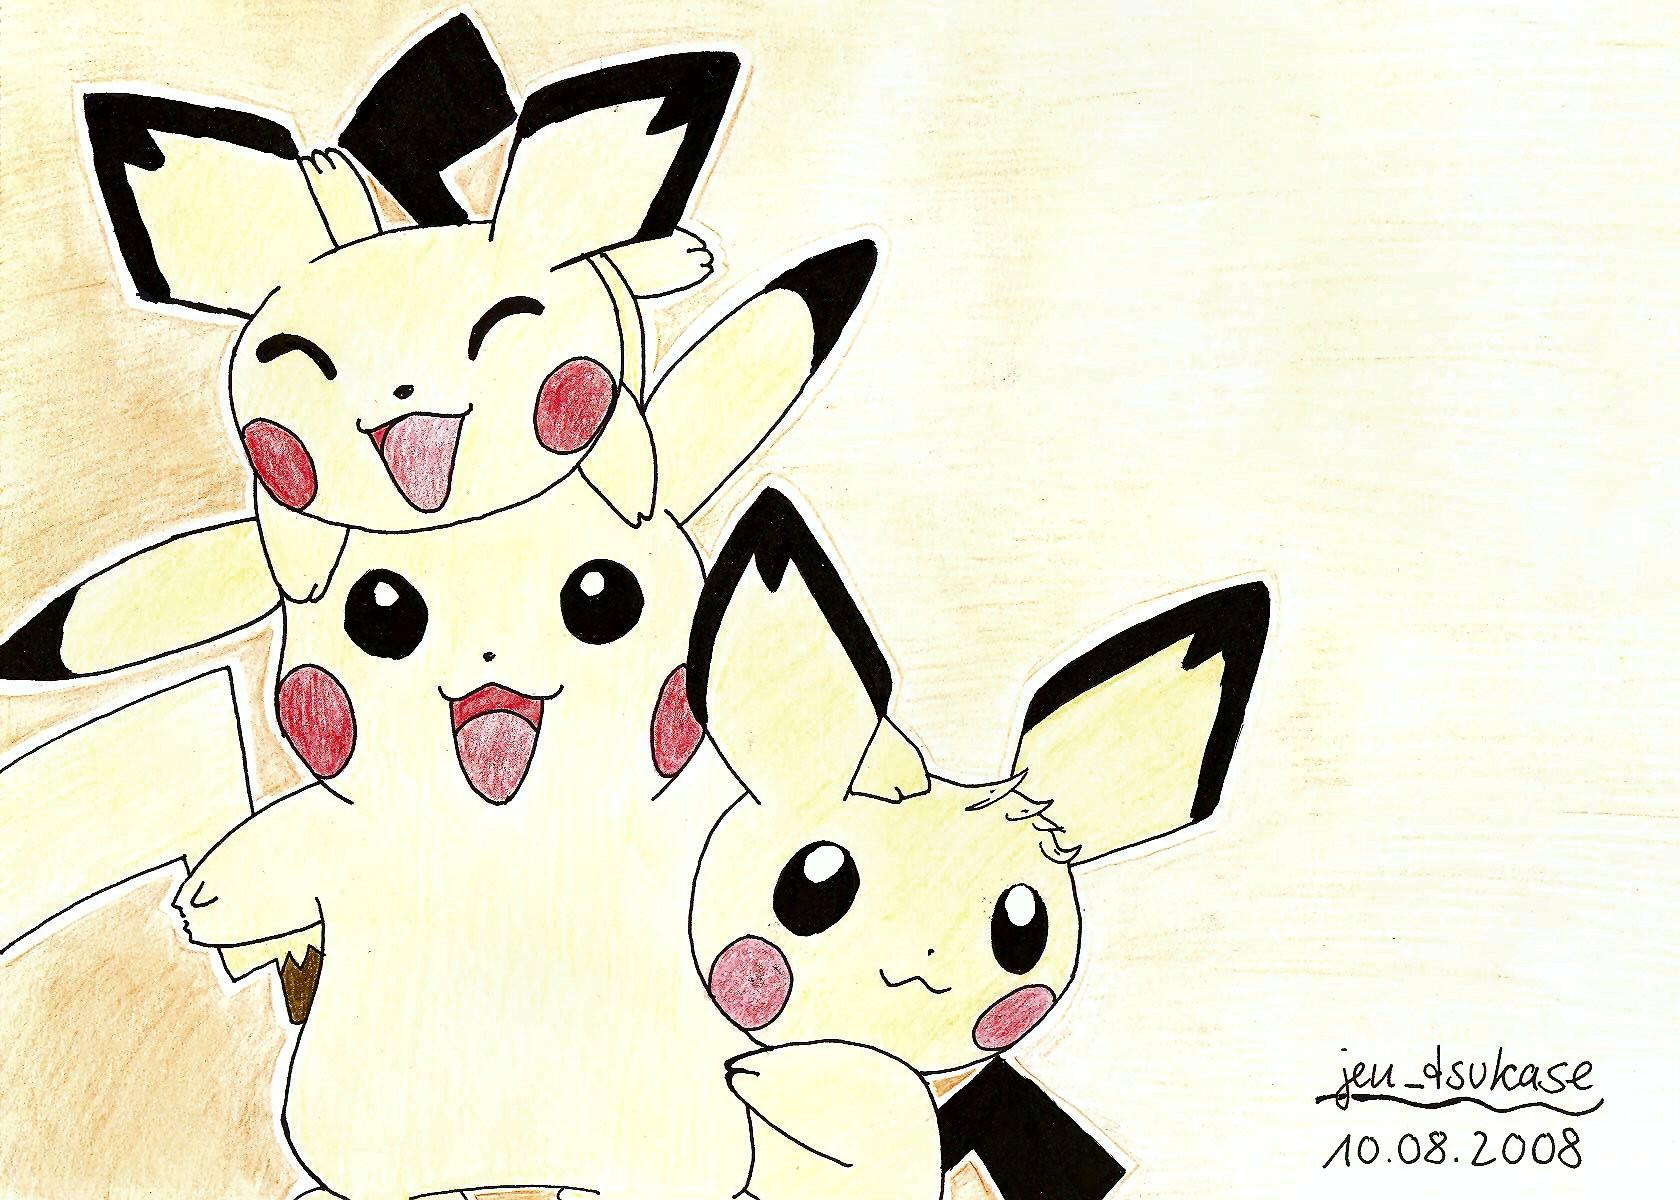 Pikachu and Pichu Brothers